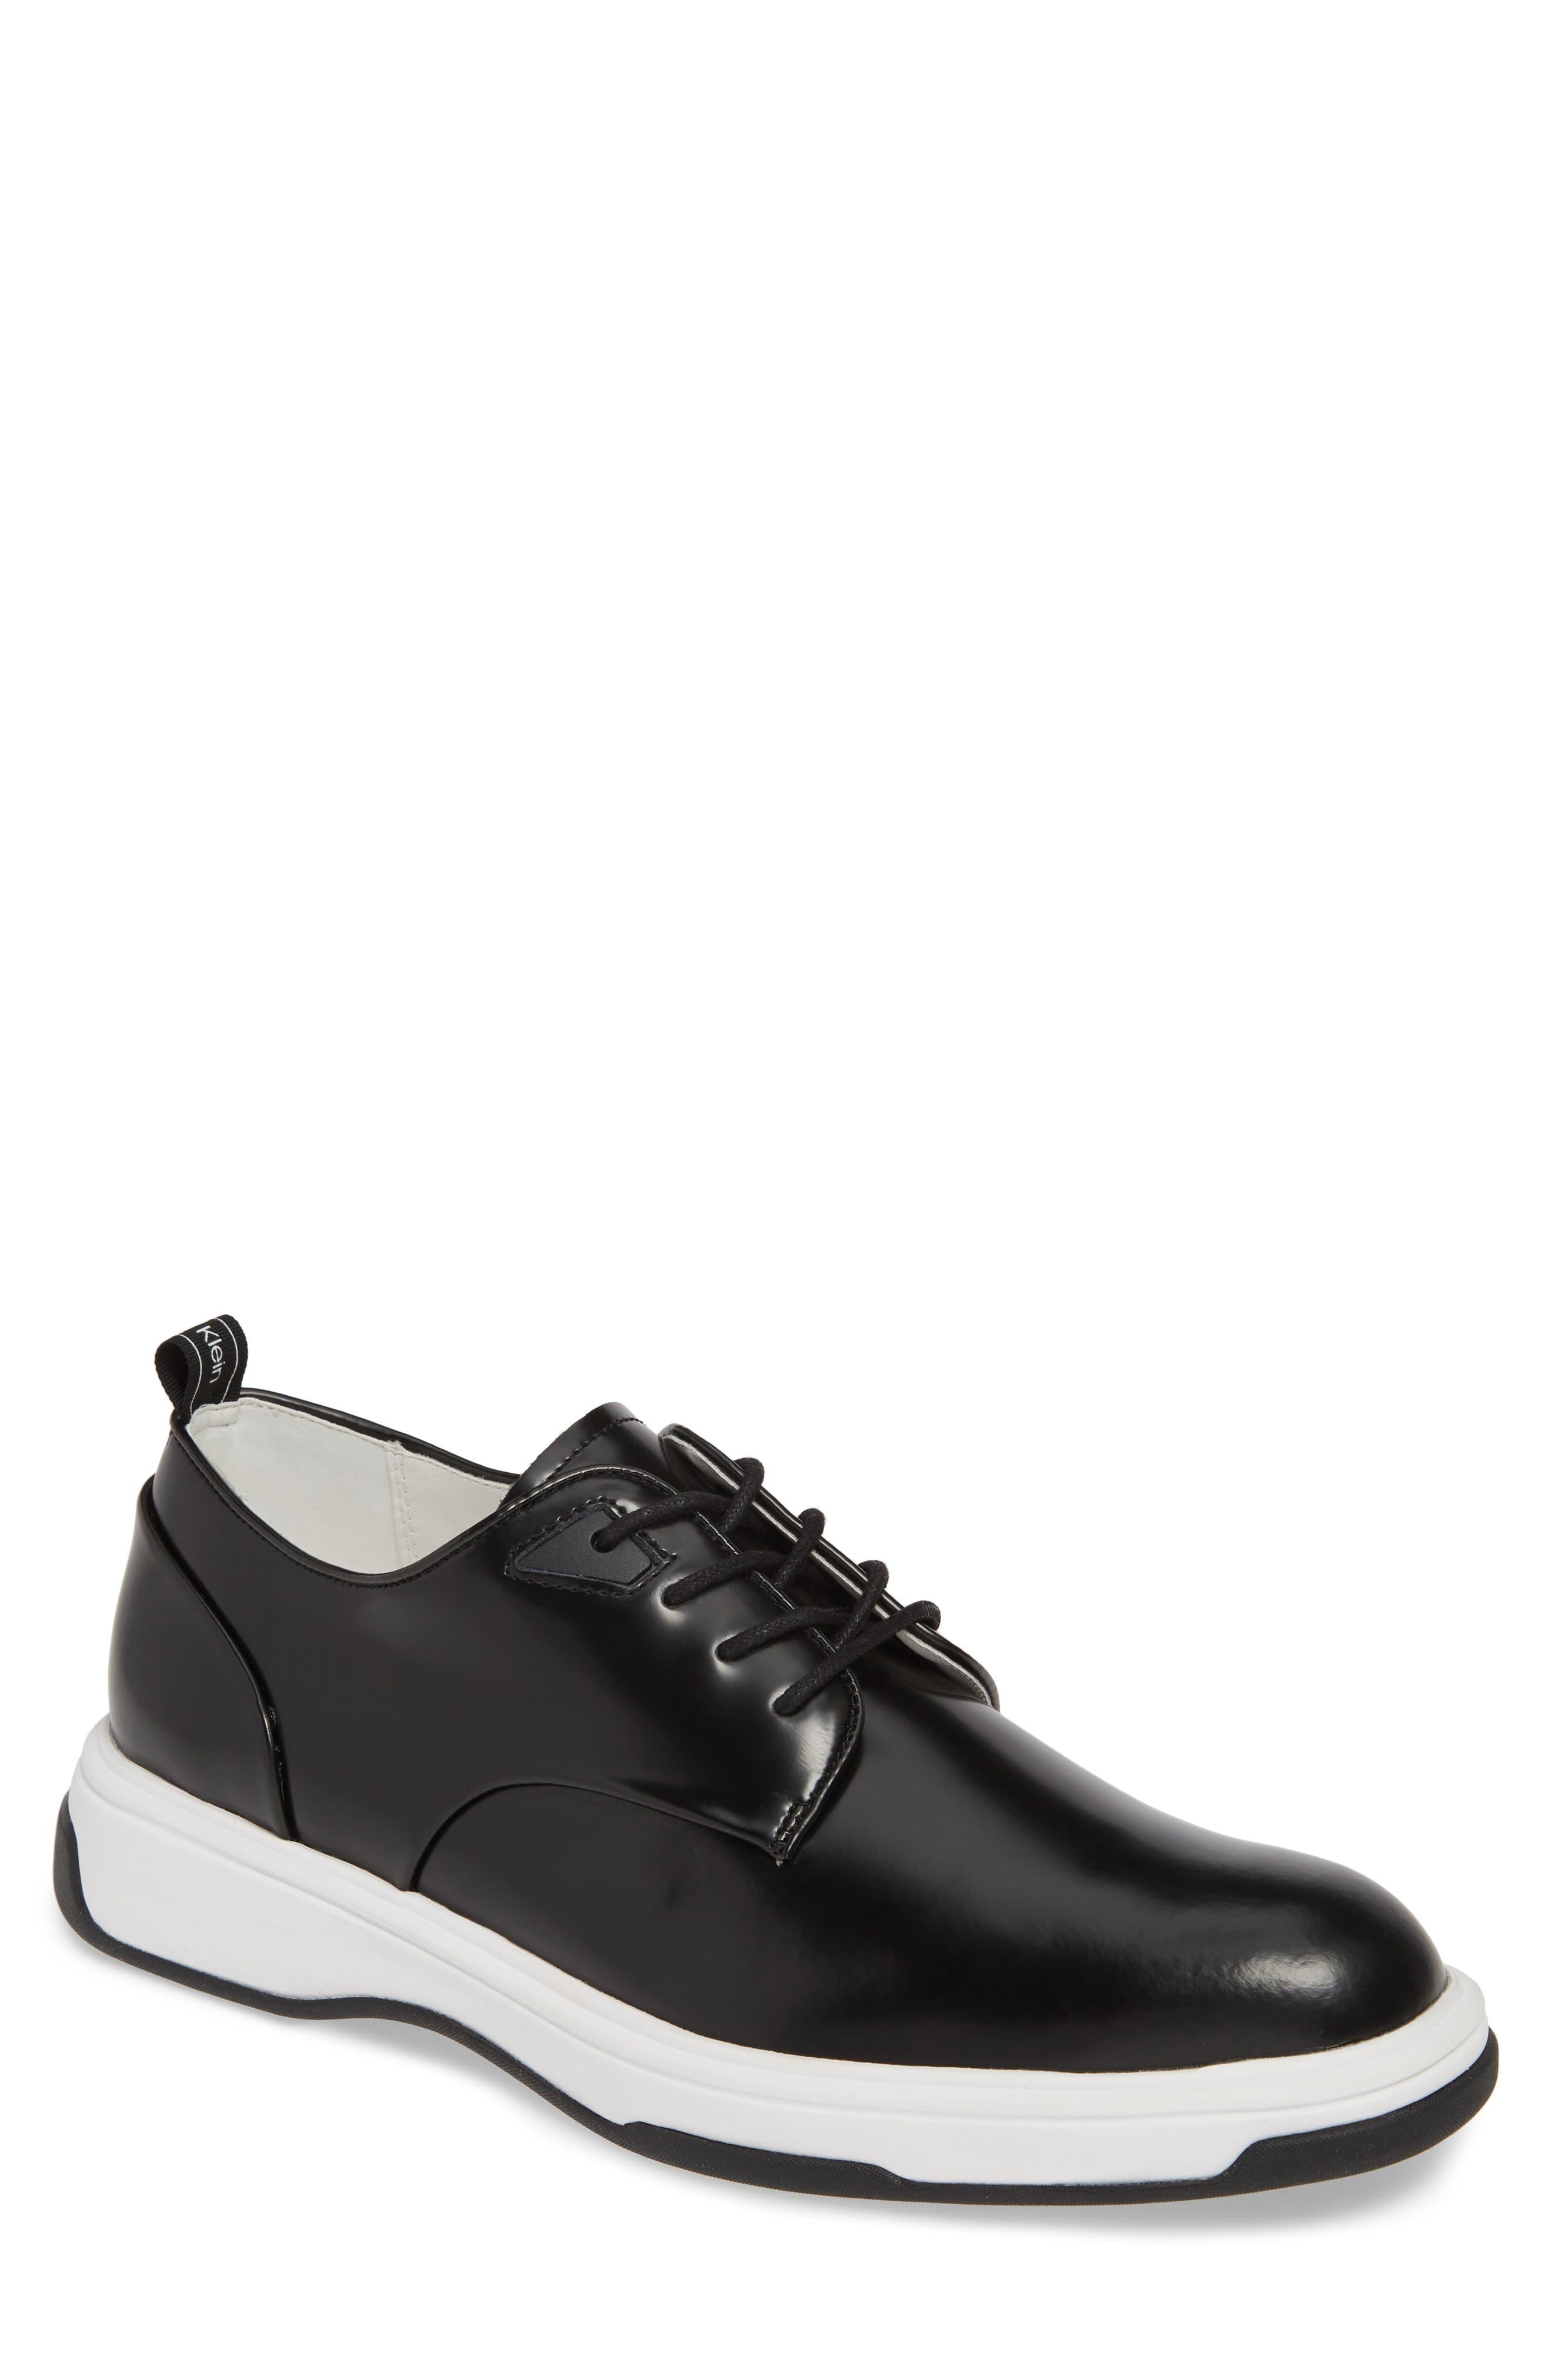 CALVIN KLEIN Patsy Sneaker, Main, color, BLACK